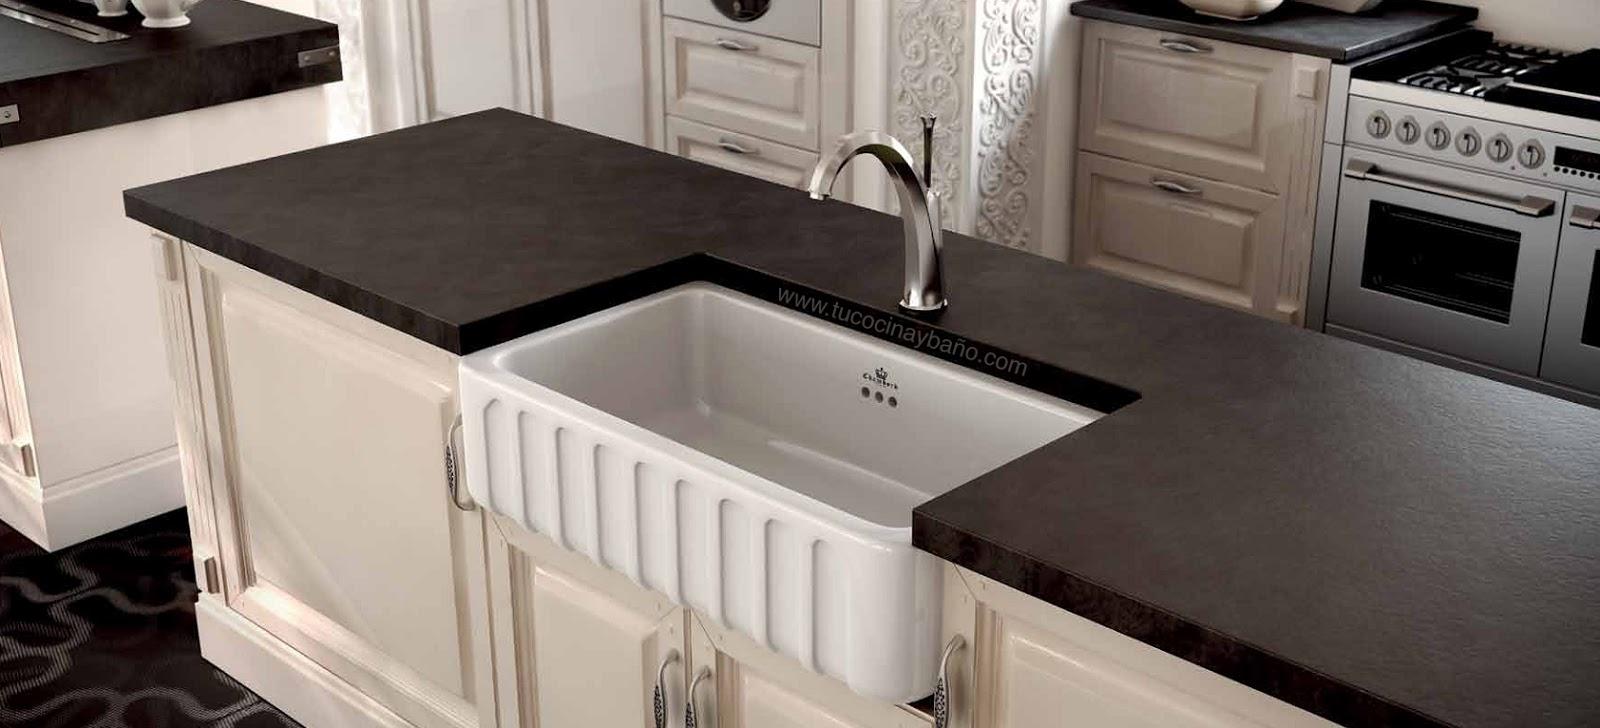 Fregadero ceramico luis segundo tu cocina y ba o for Ceramica de cocina precios